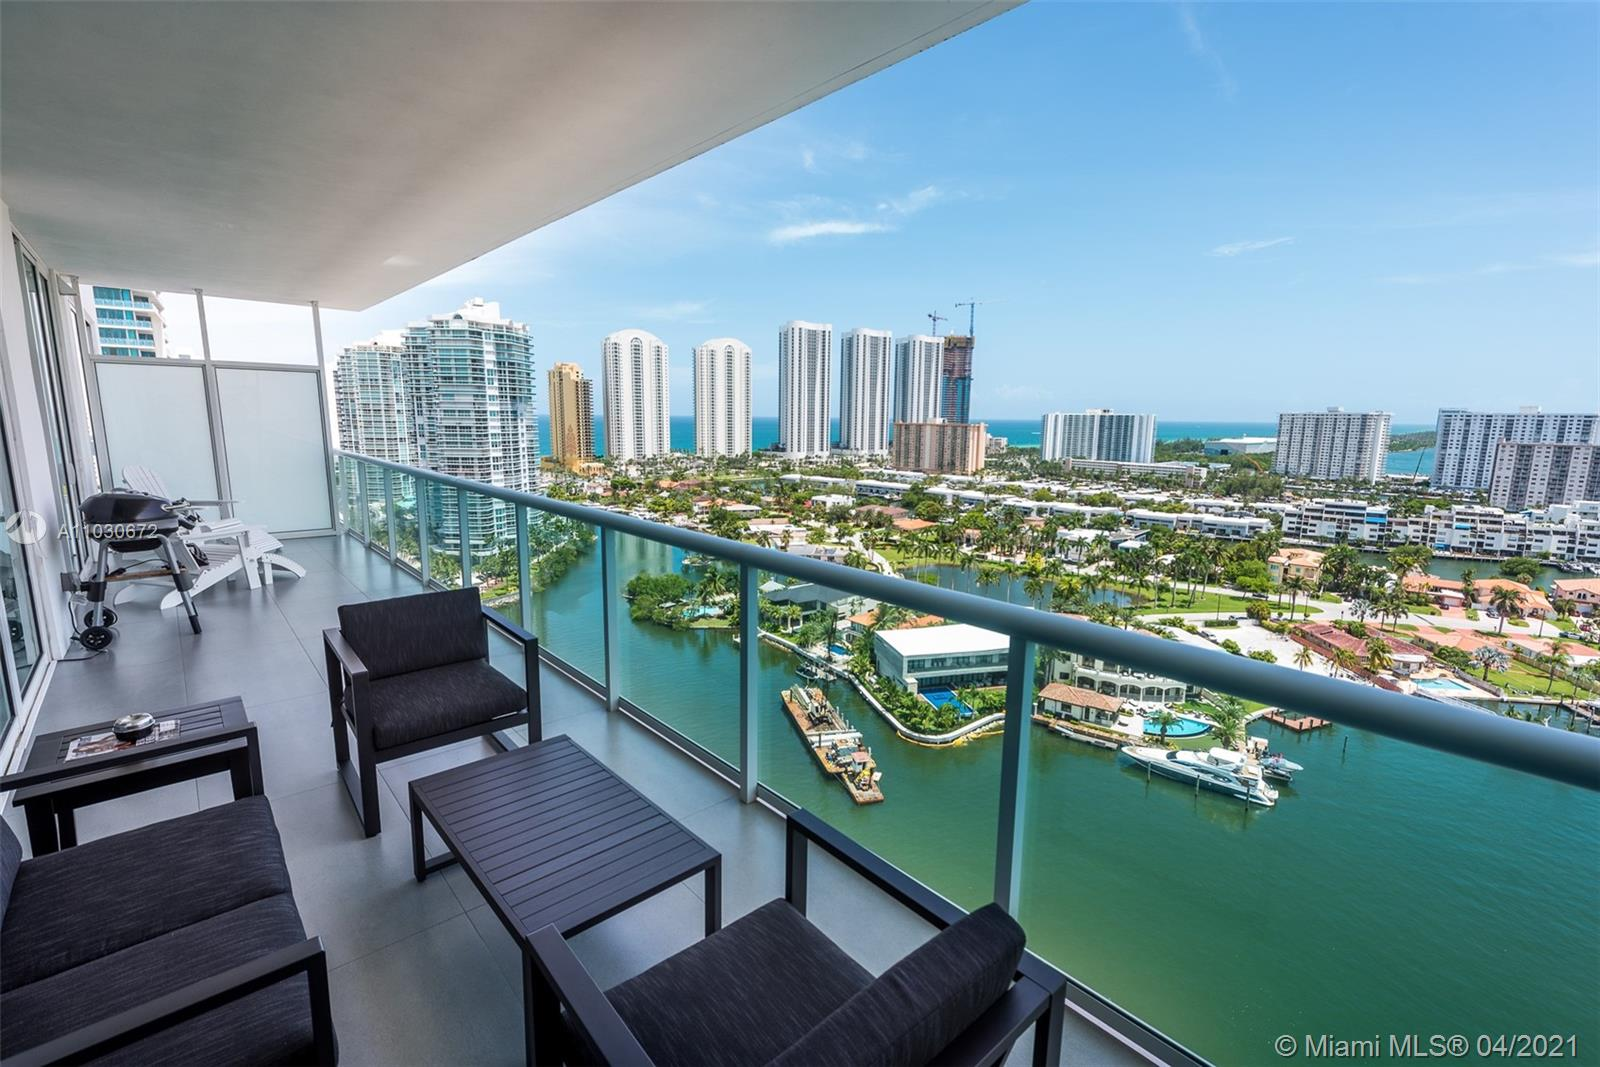 400 Sunny Isles #2021 - 400 Sunny Isles Blvd #2021, Sunny Isles Beach, FL 33160